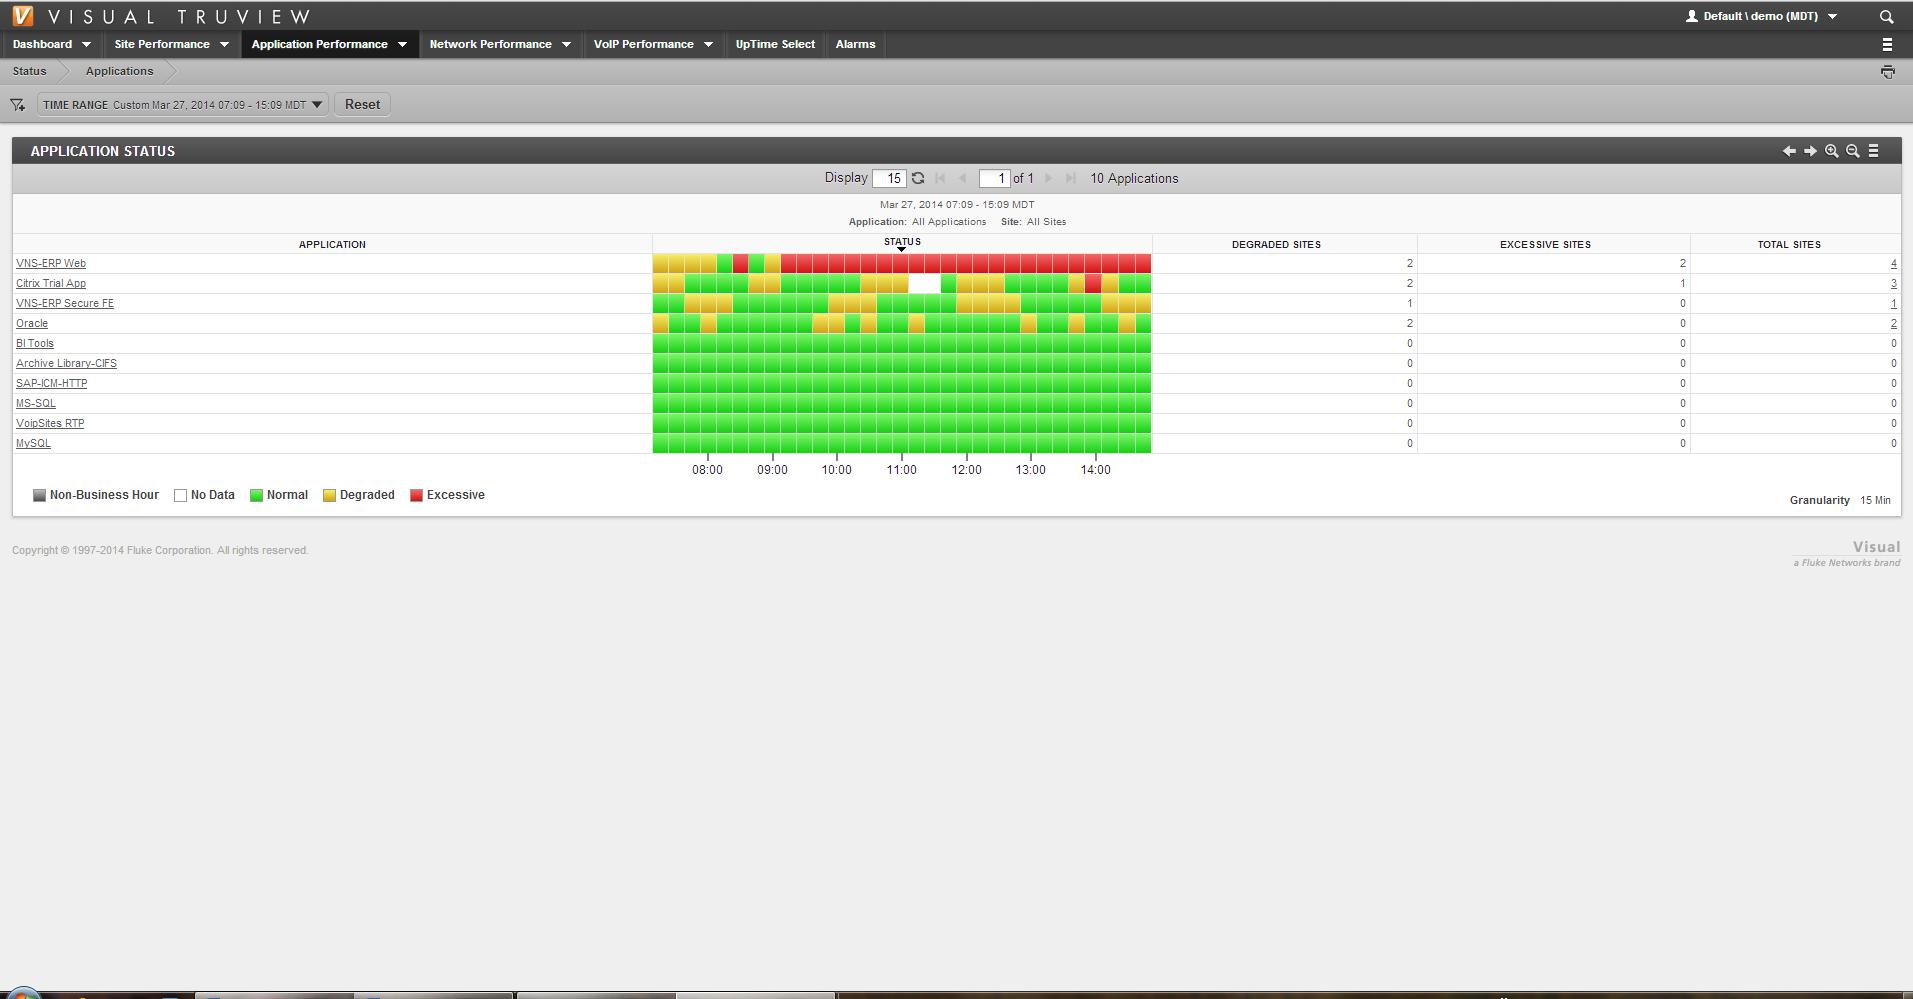 Fluke TruView 9.0 Application Performance